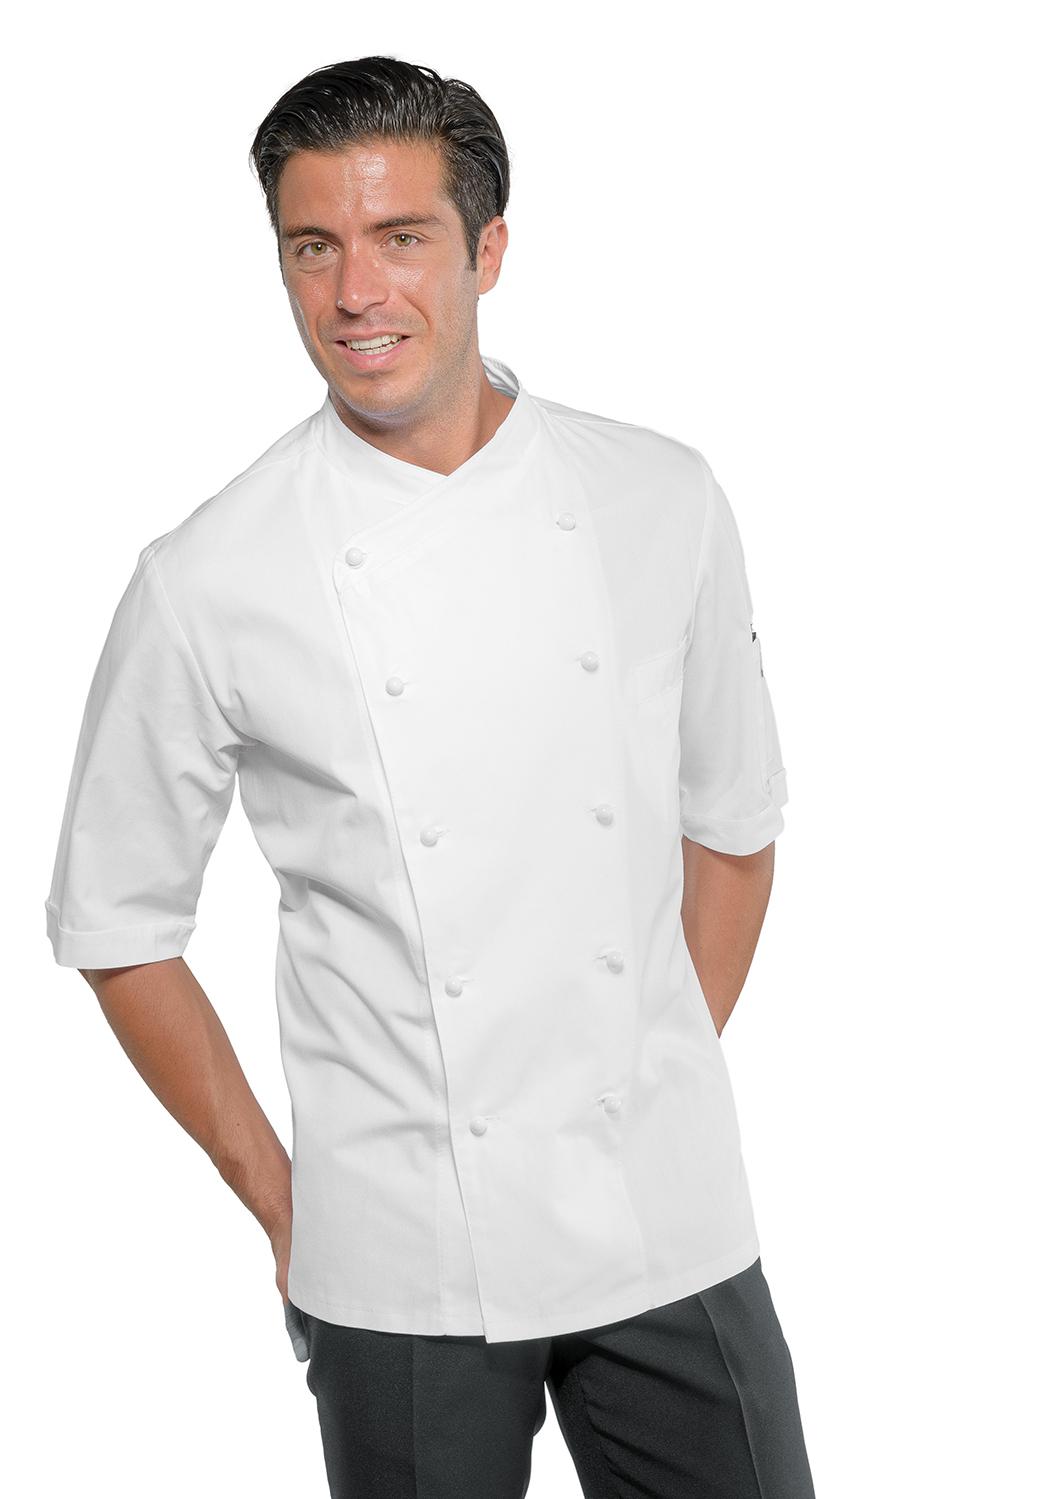 Veste blanche chef cuisine manches courtes v tements de for Veste de cuisine manche courte